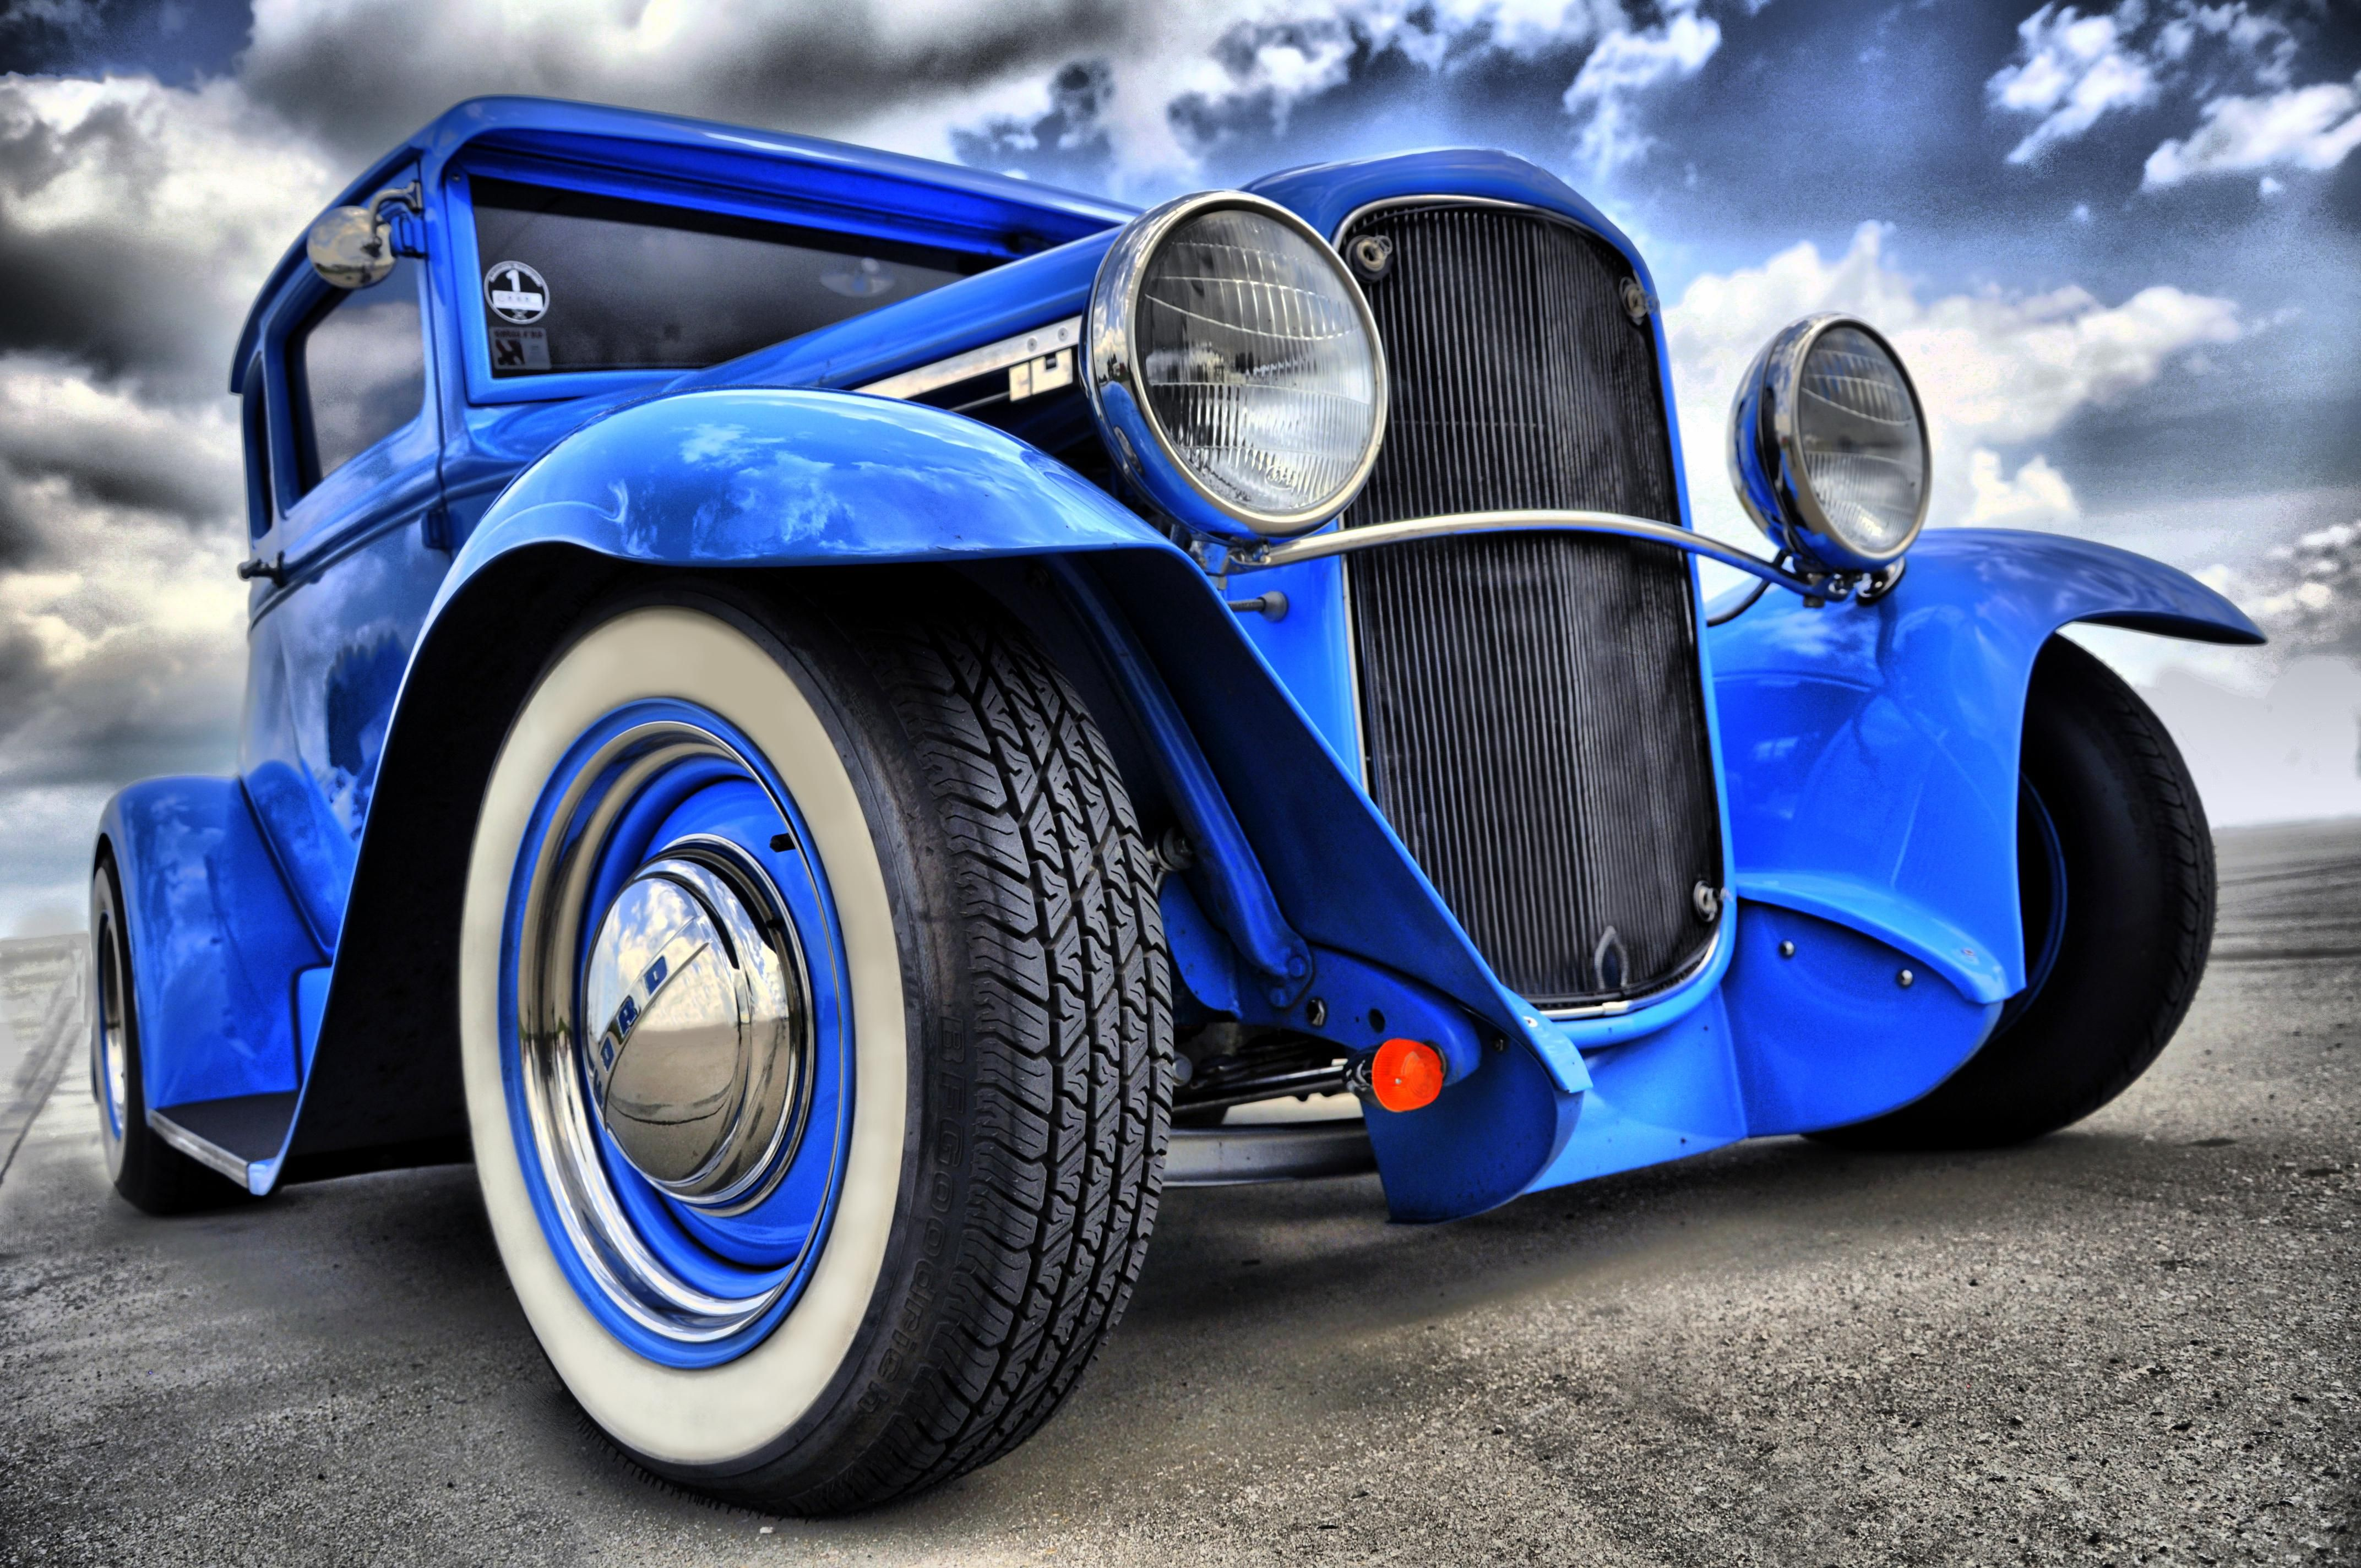 Wallpapers antique car, drawing, car, hot rod, classic car